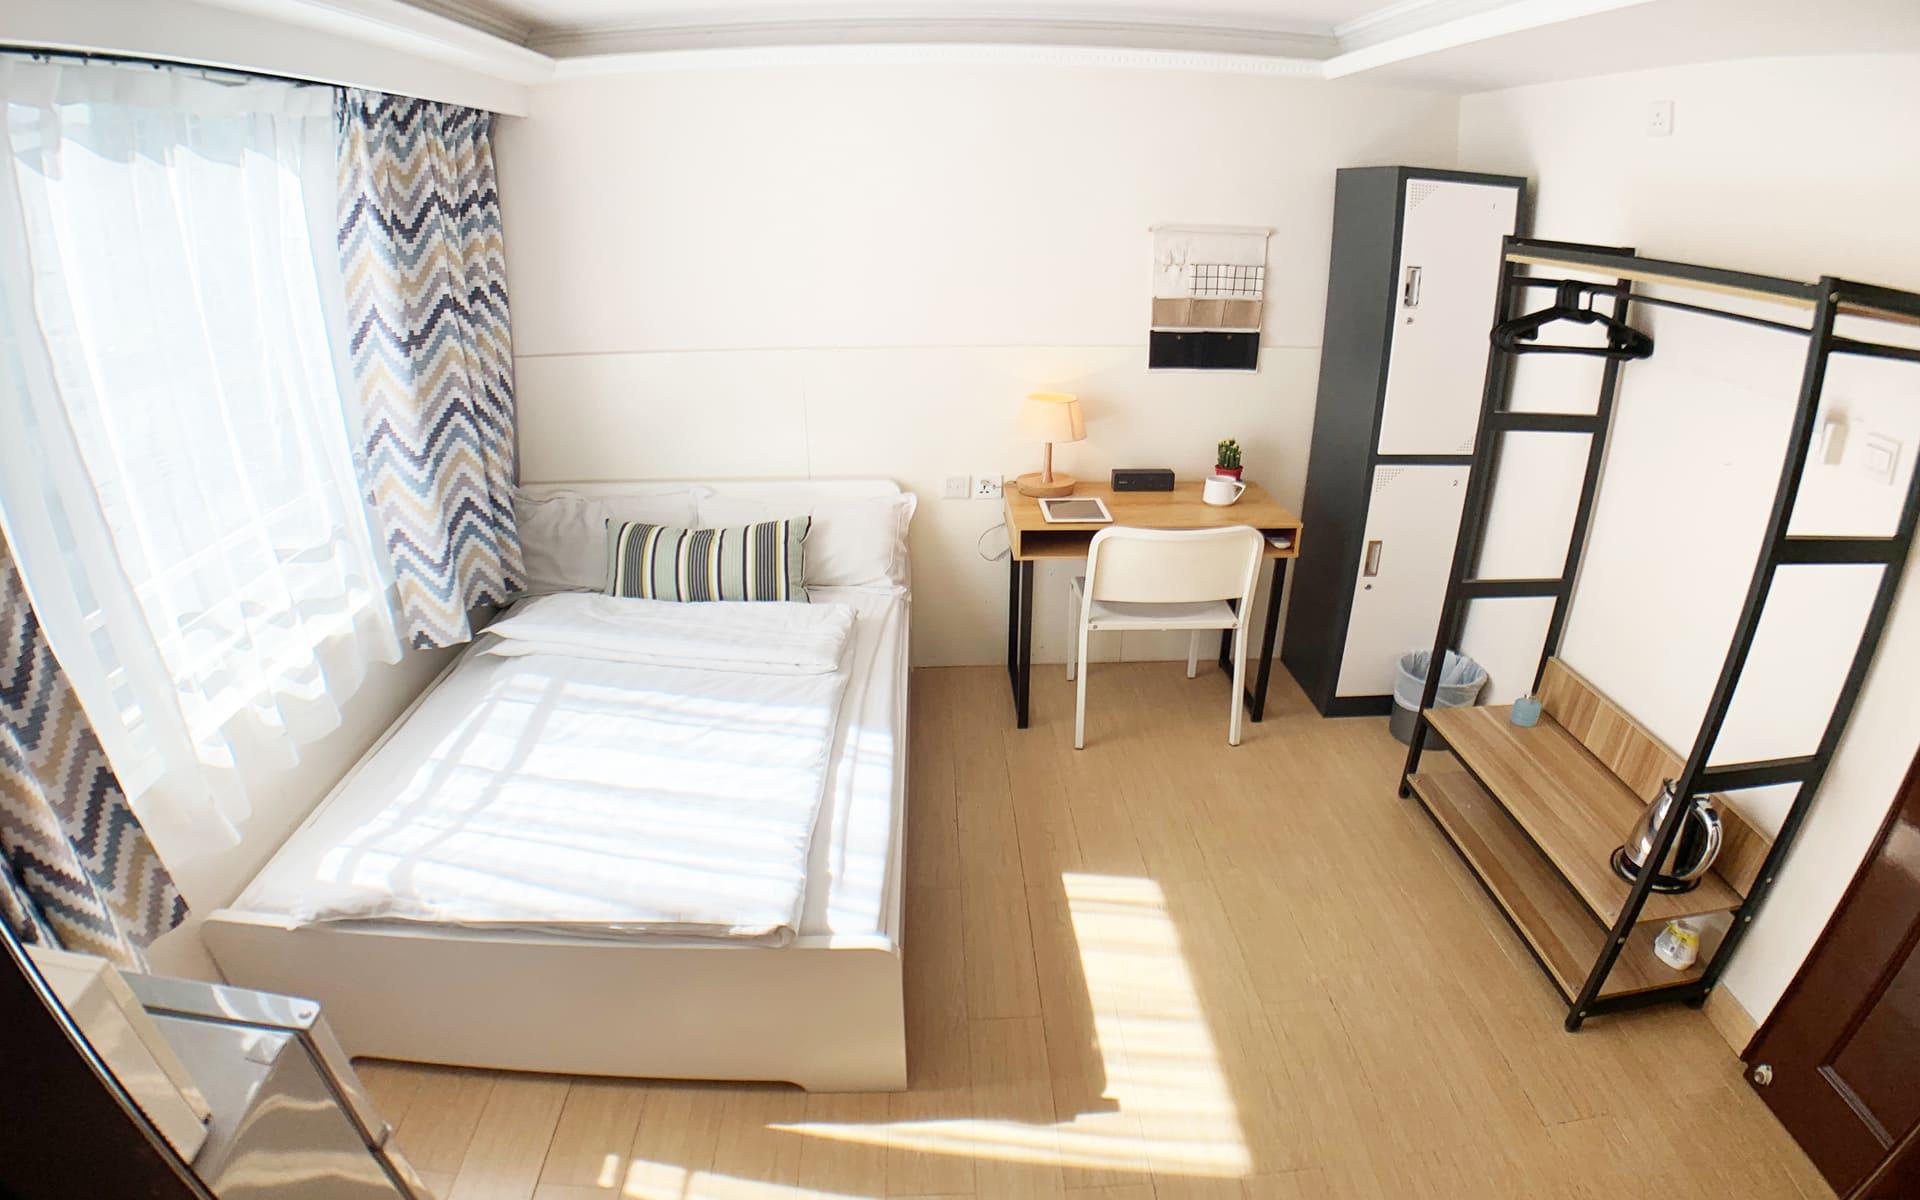 hk_service_apartment_16908122991596784541.jpg